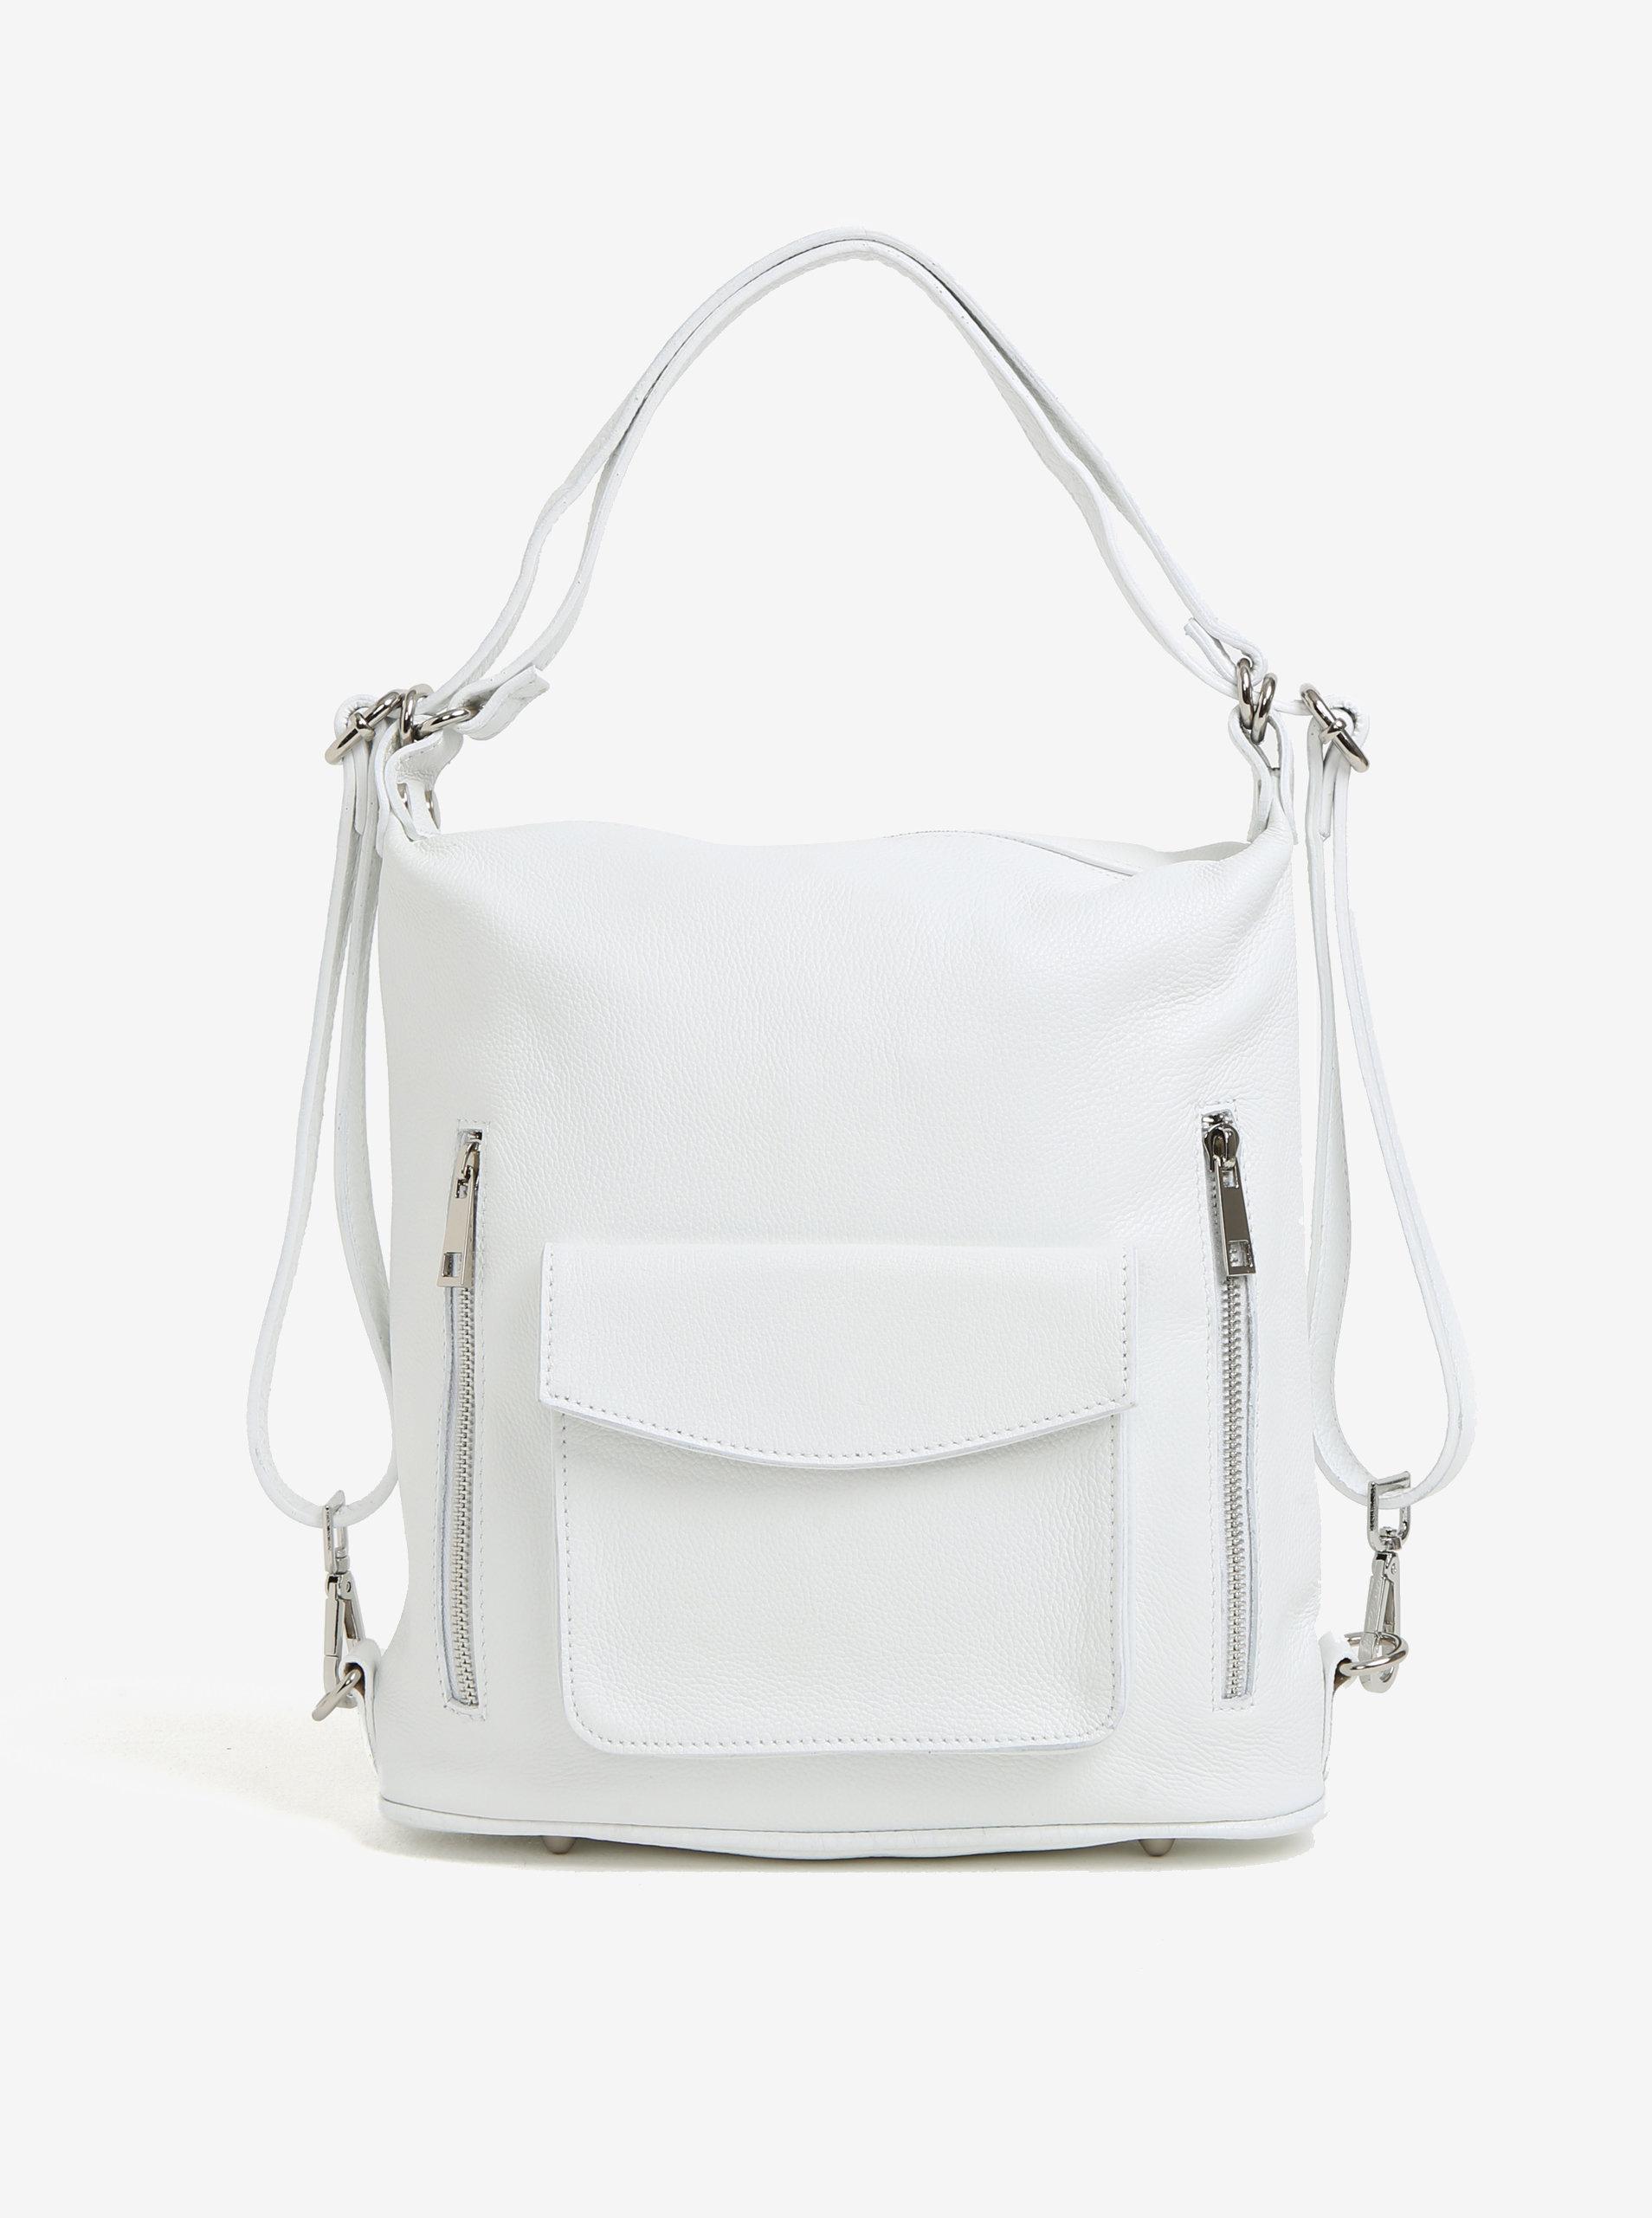 bd980d4308 Bílá dámská kožená kabelka s kapsami KARA ...